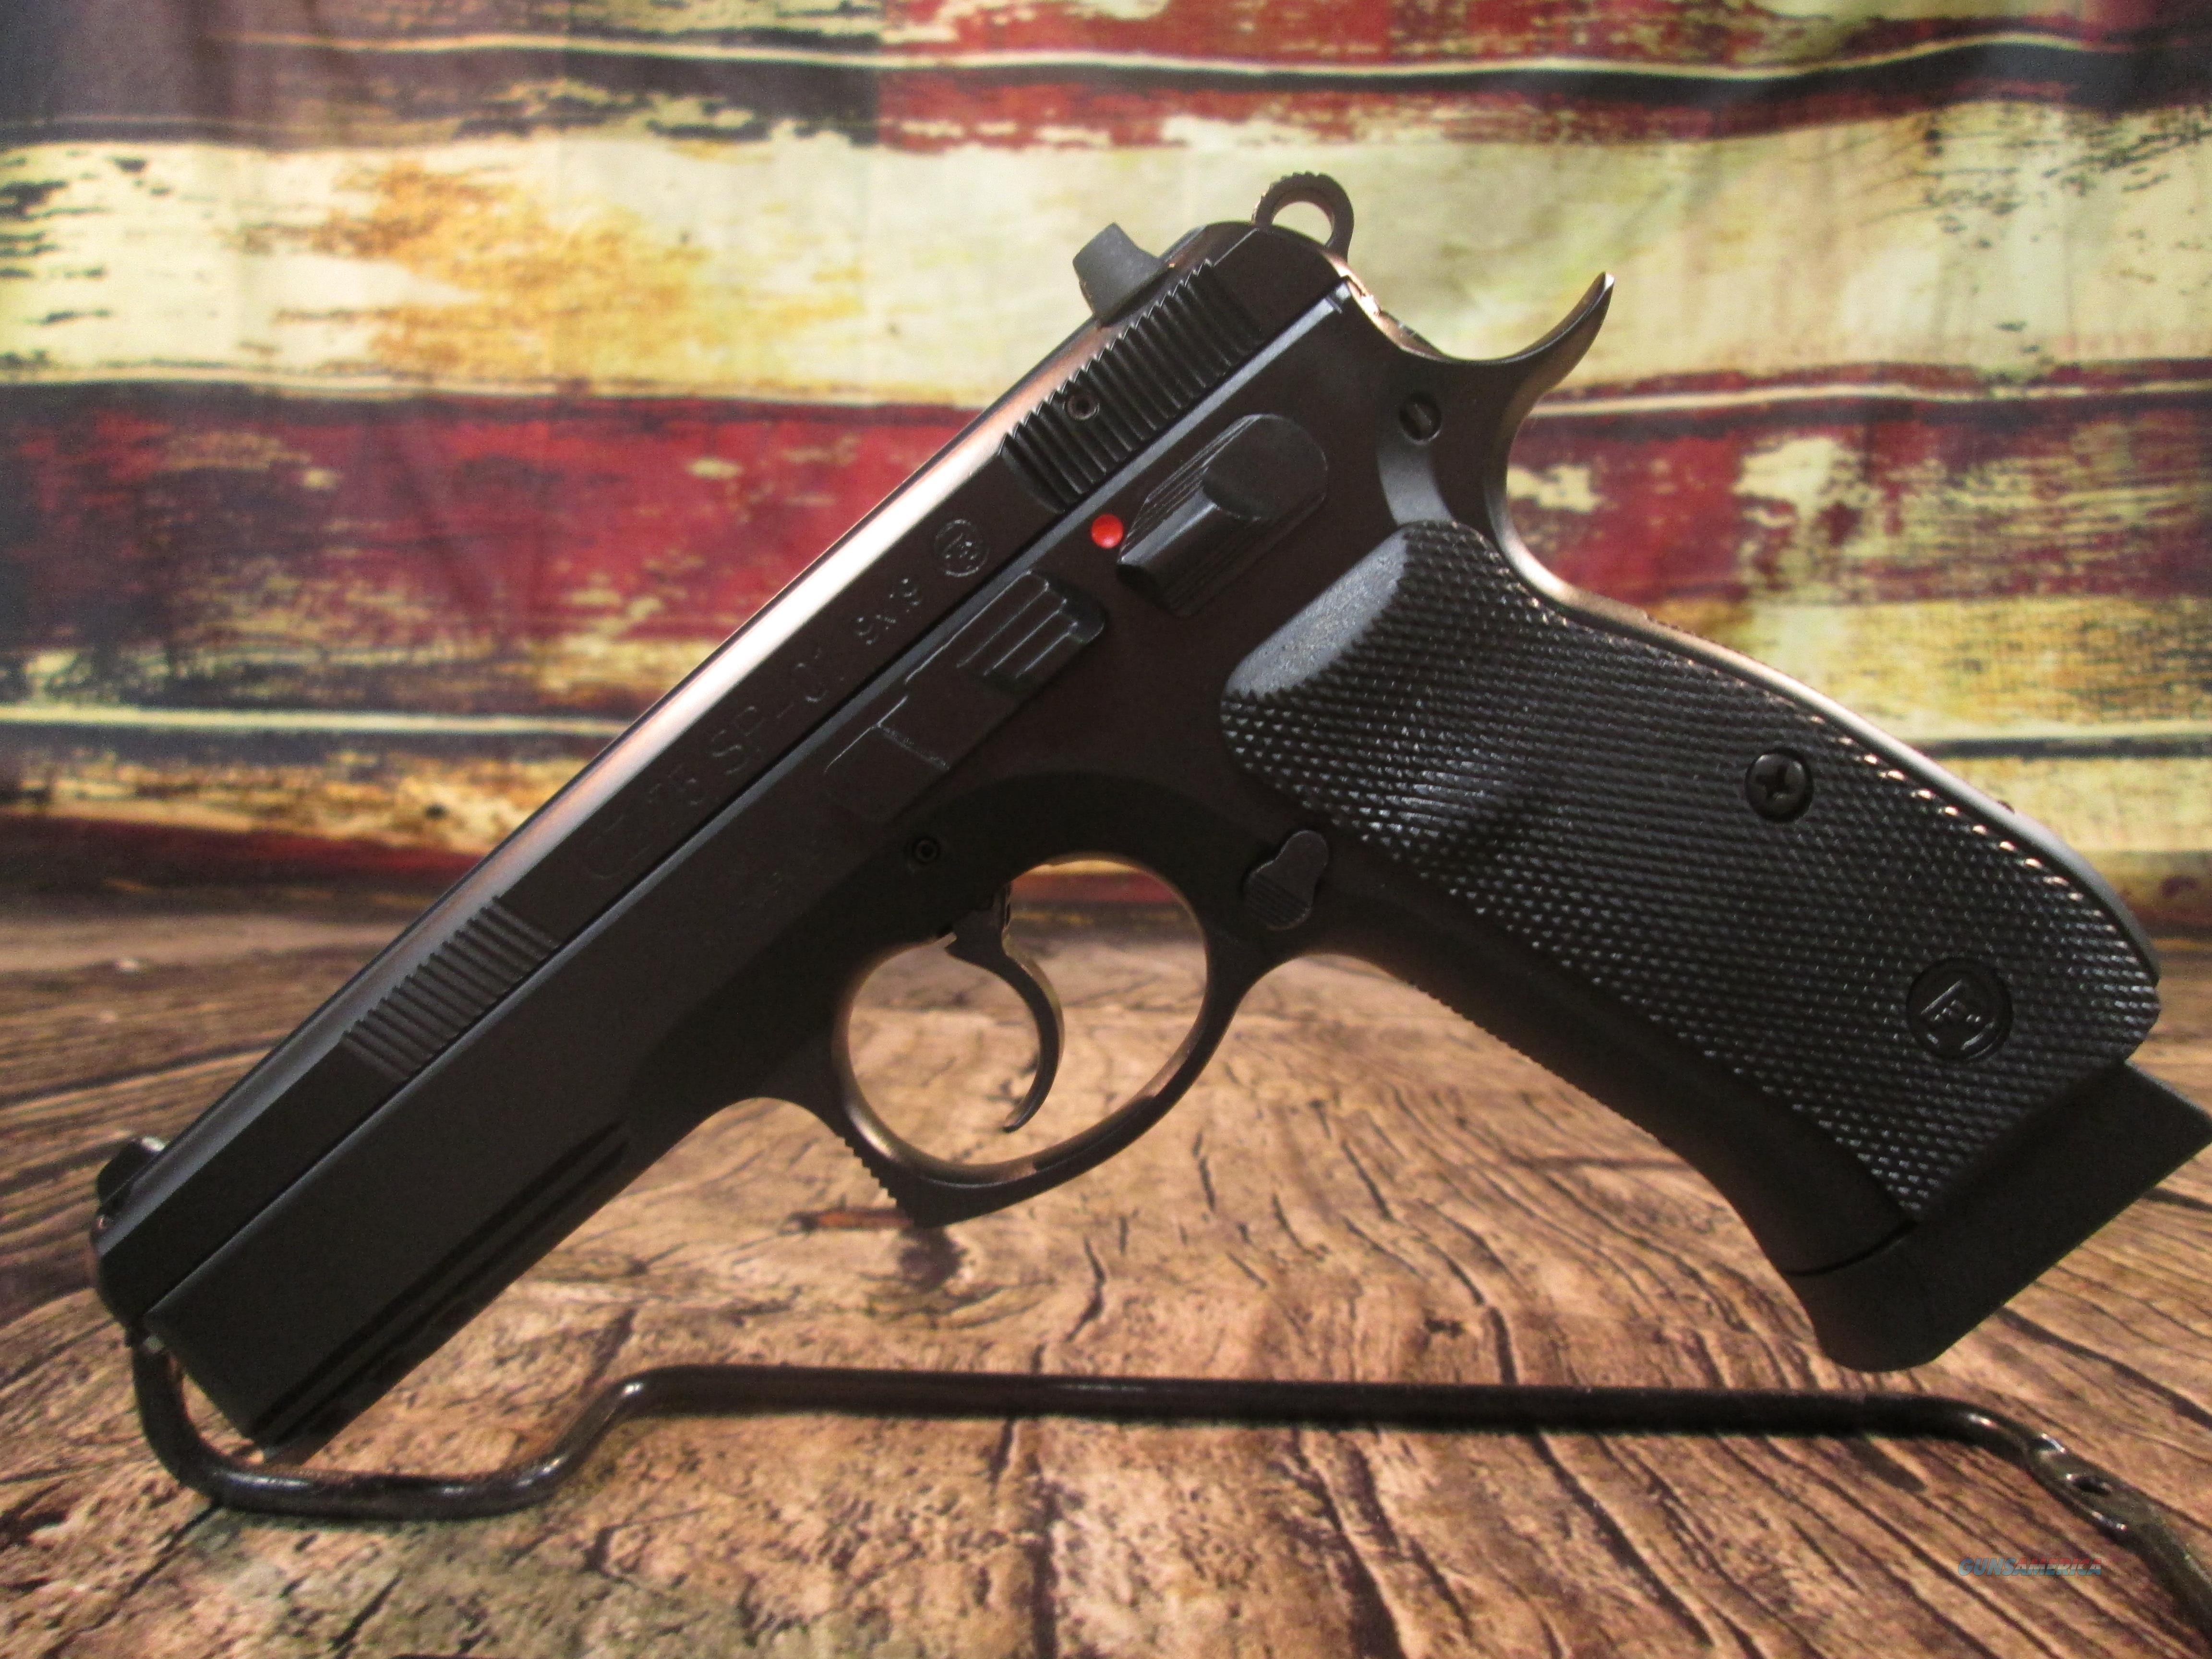 CZ 75 SP-01 9MM NEW (91152)  Guns > Pistols > CZ Pistols